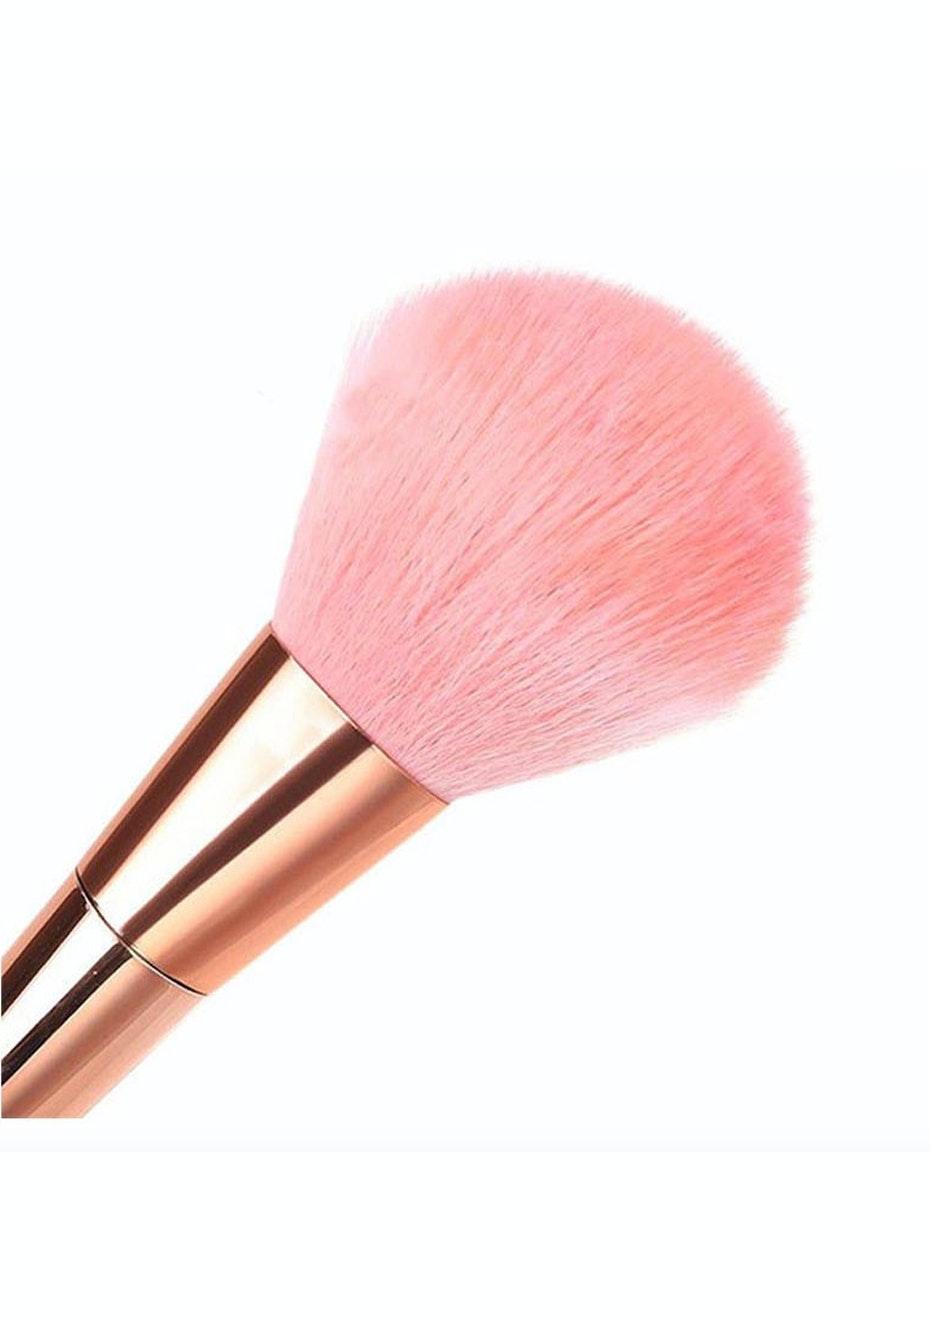 7Pcs Rose Gold Makeup Brushes Set